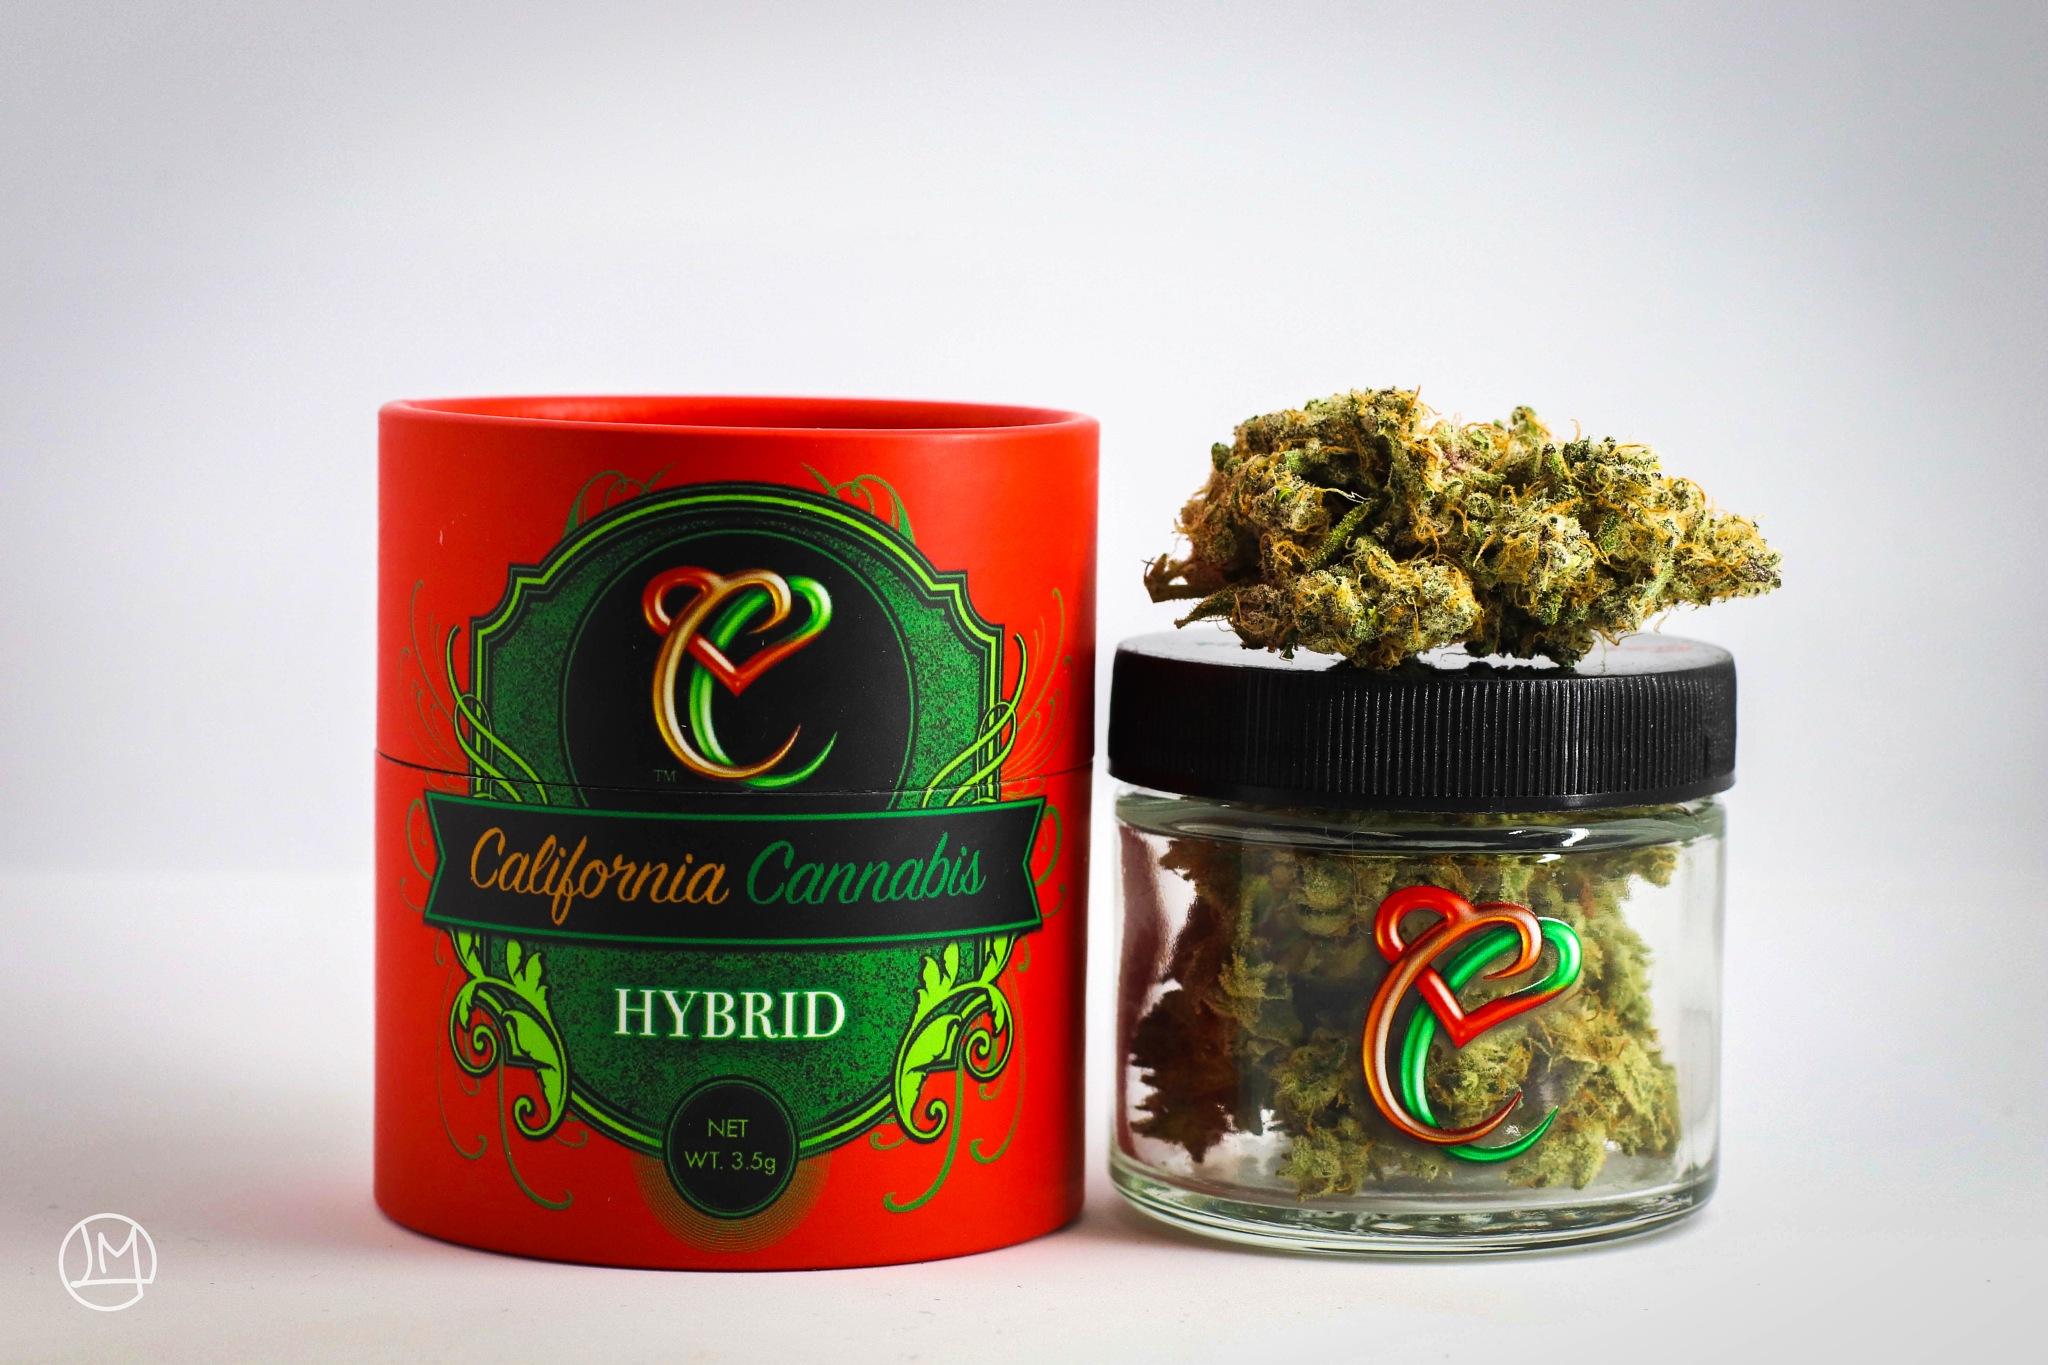 California Cannabis Product Photo by Liam Ogawa